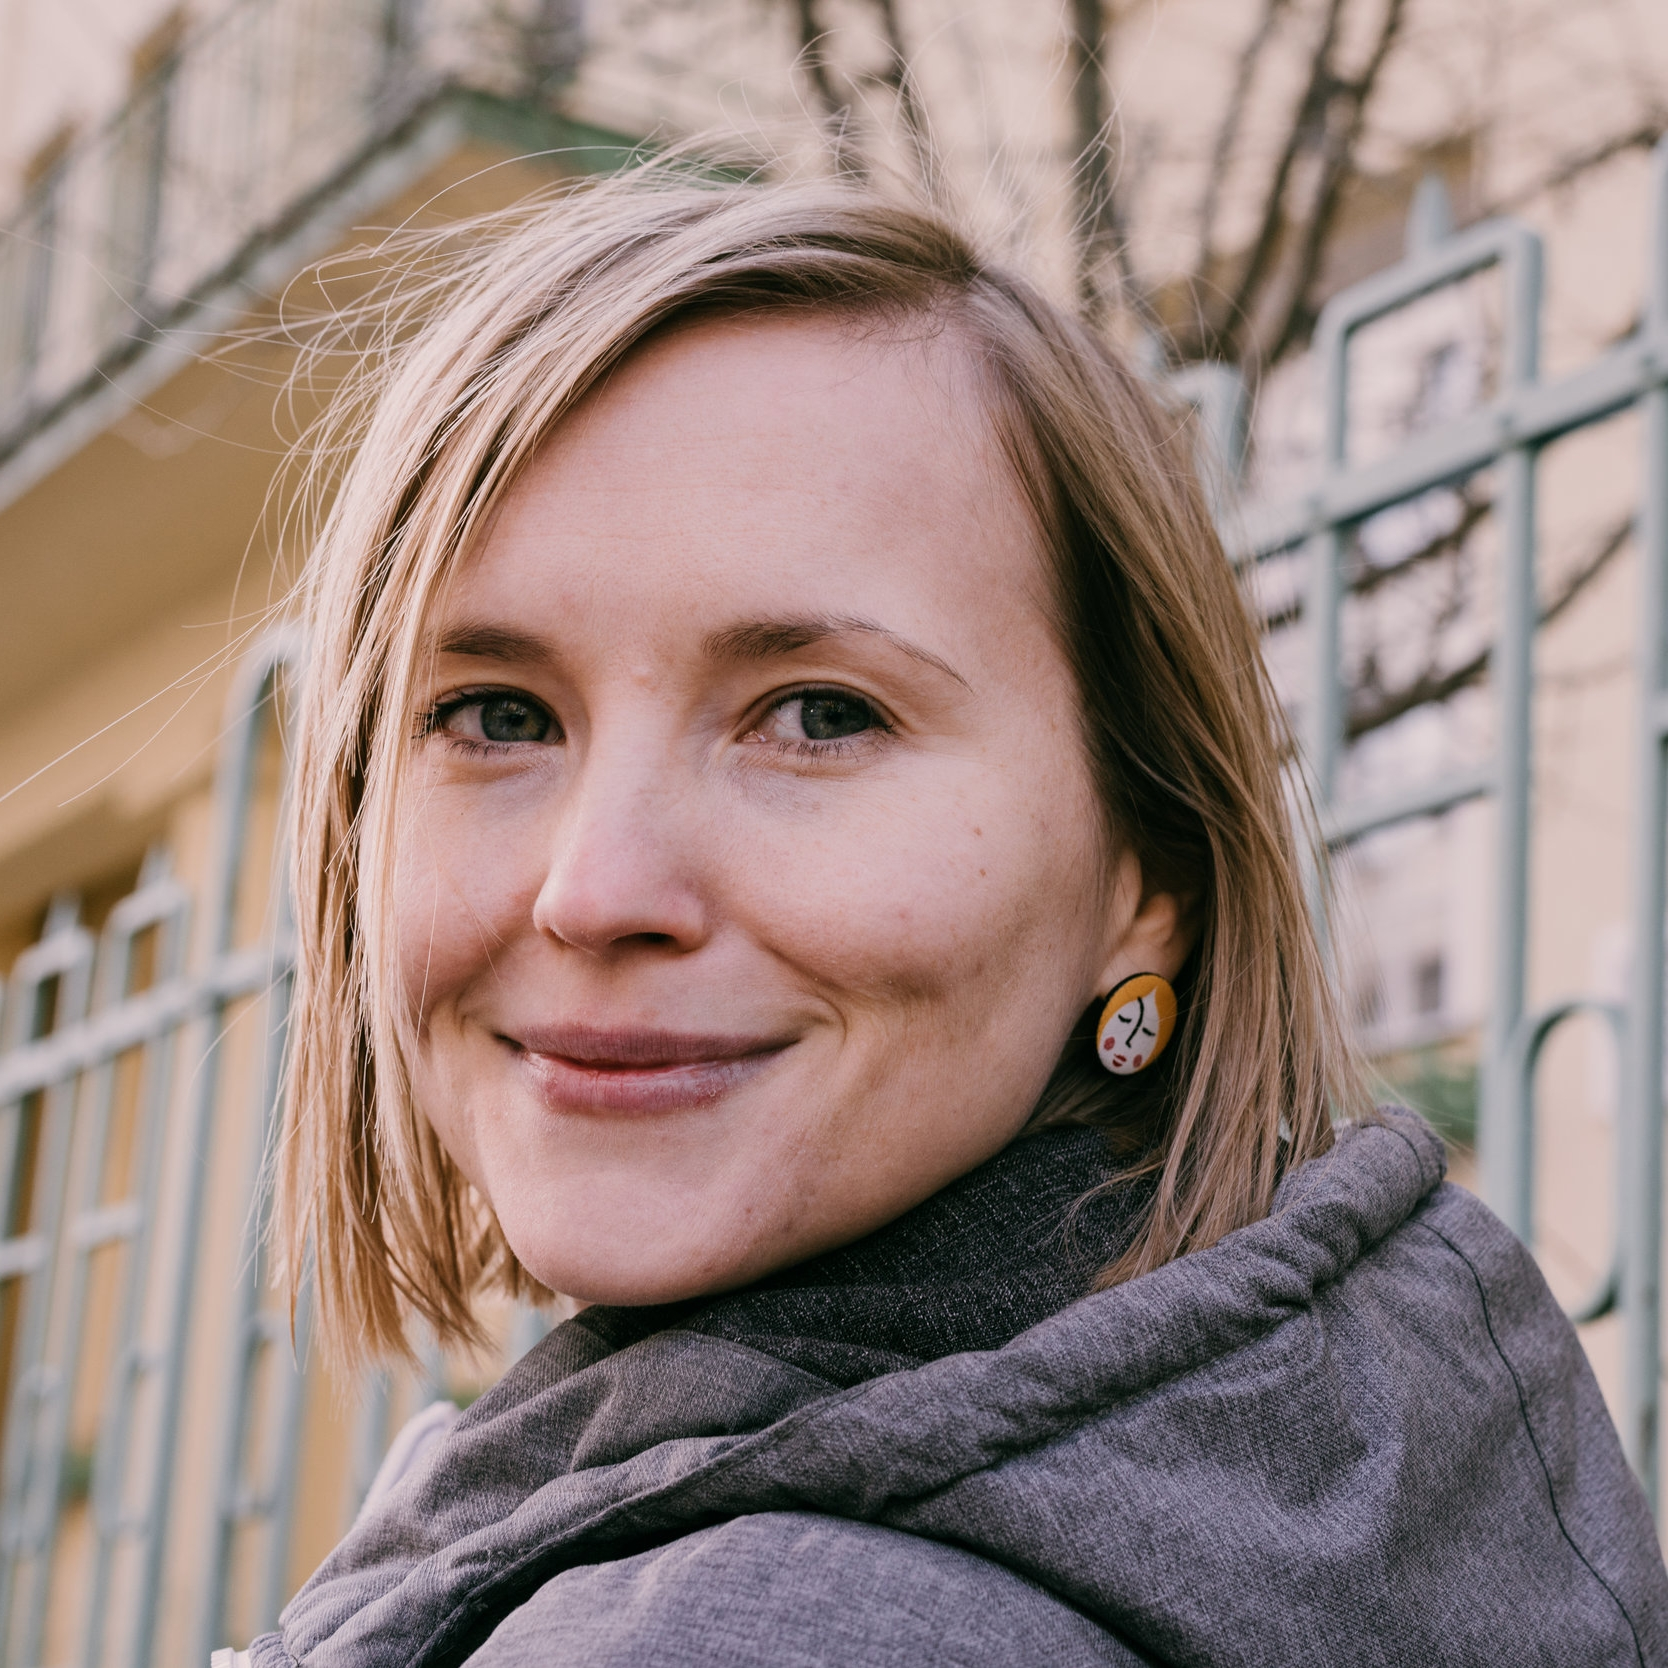 vienna-photographers-bea.jpg